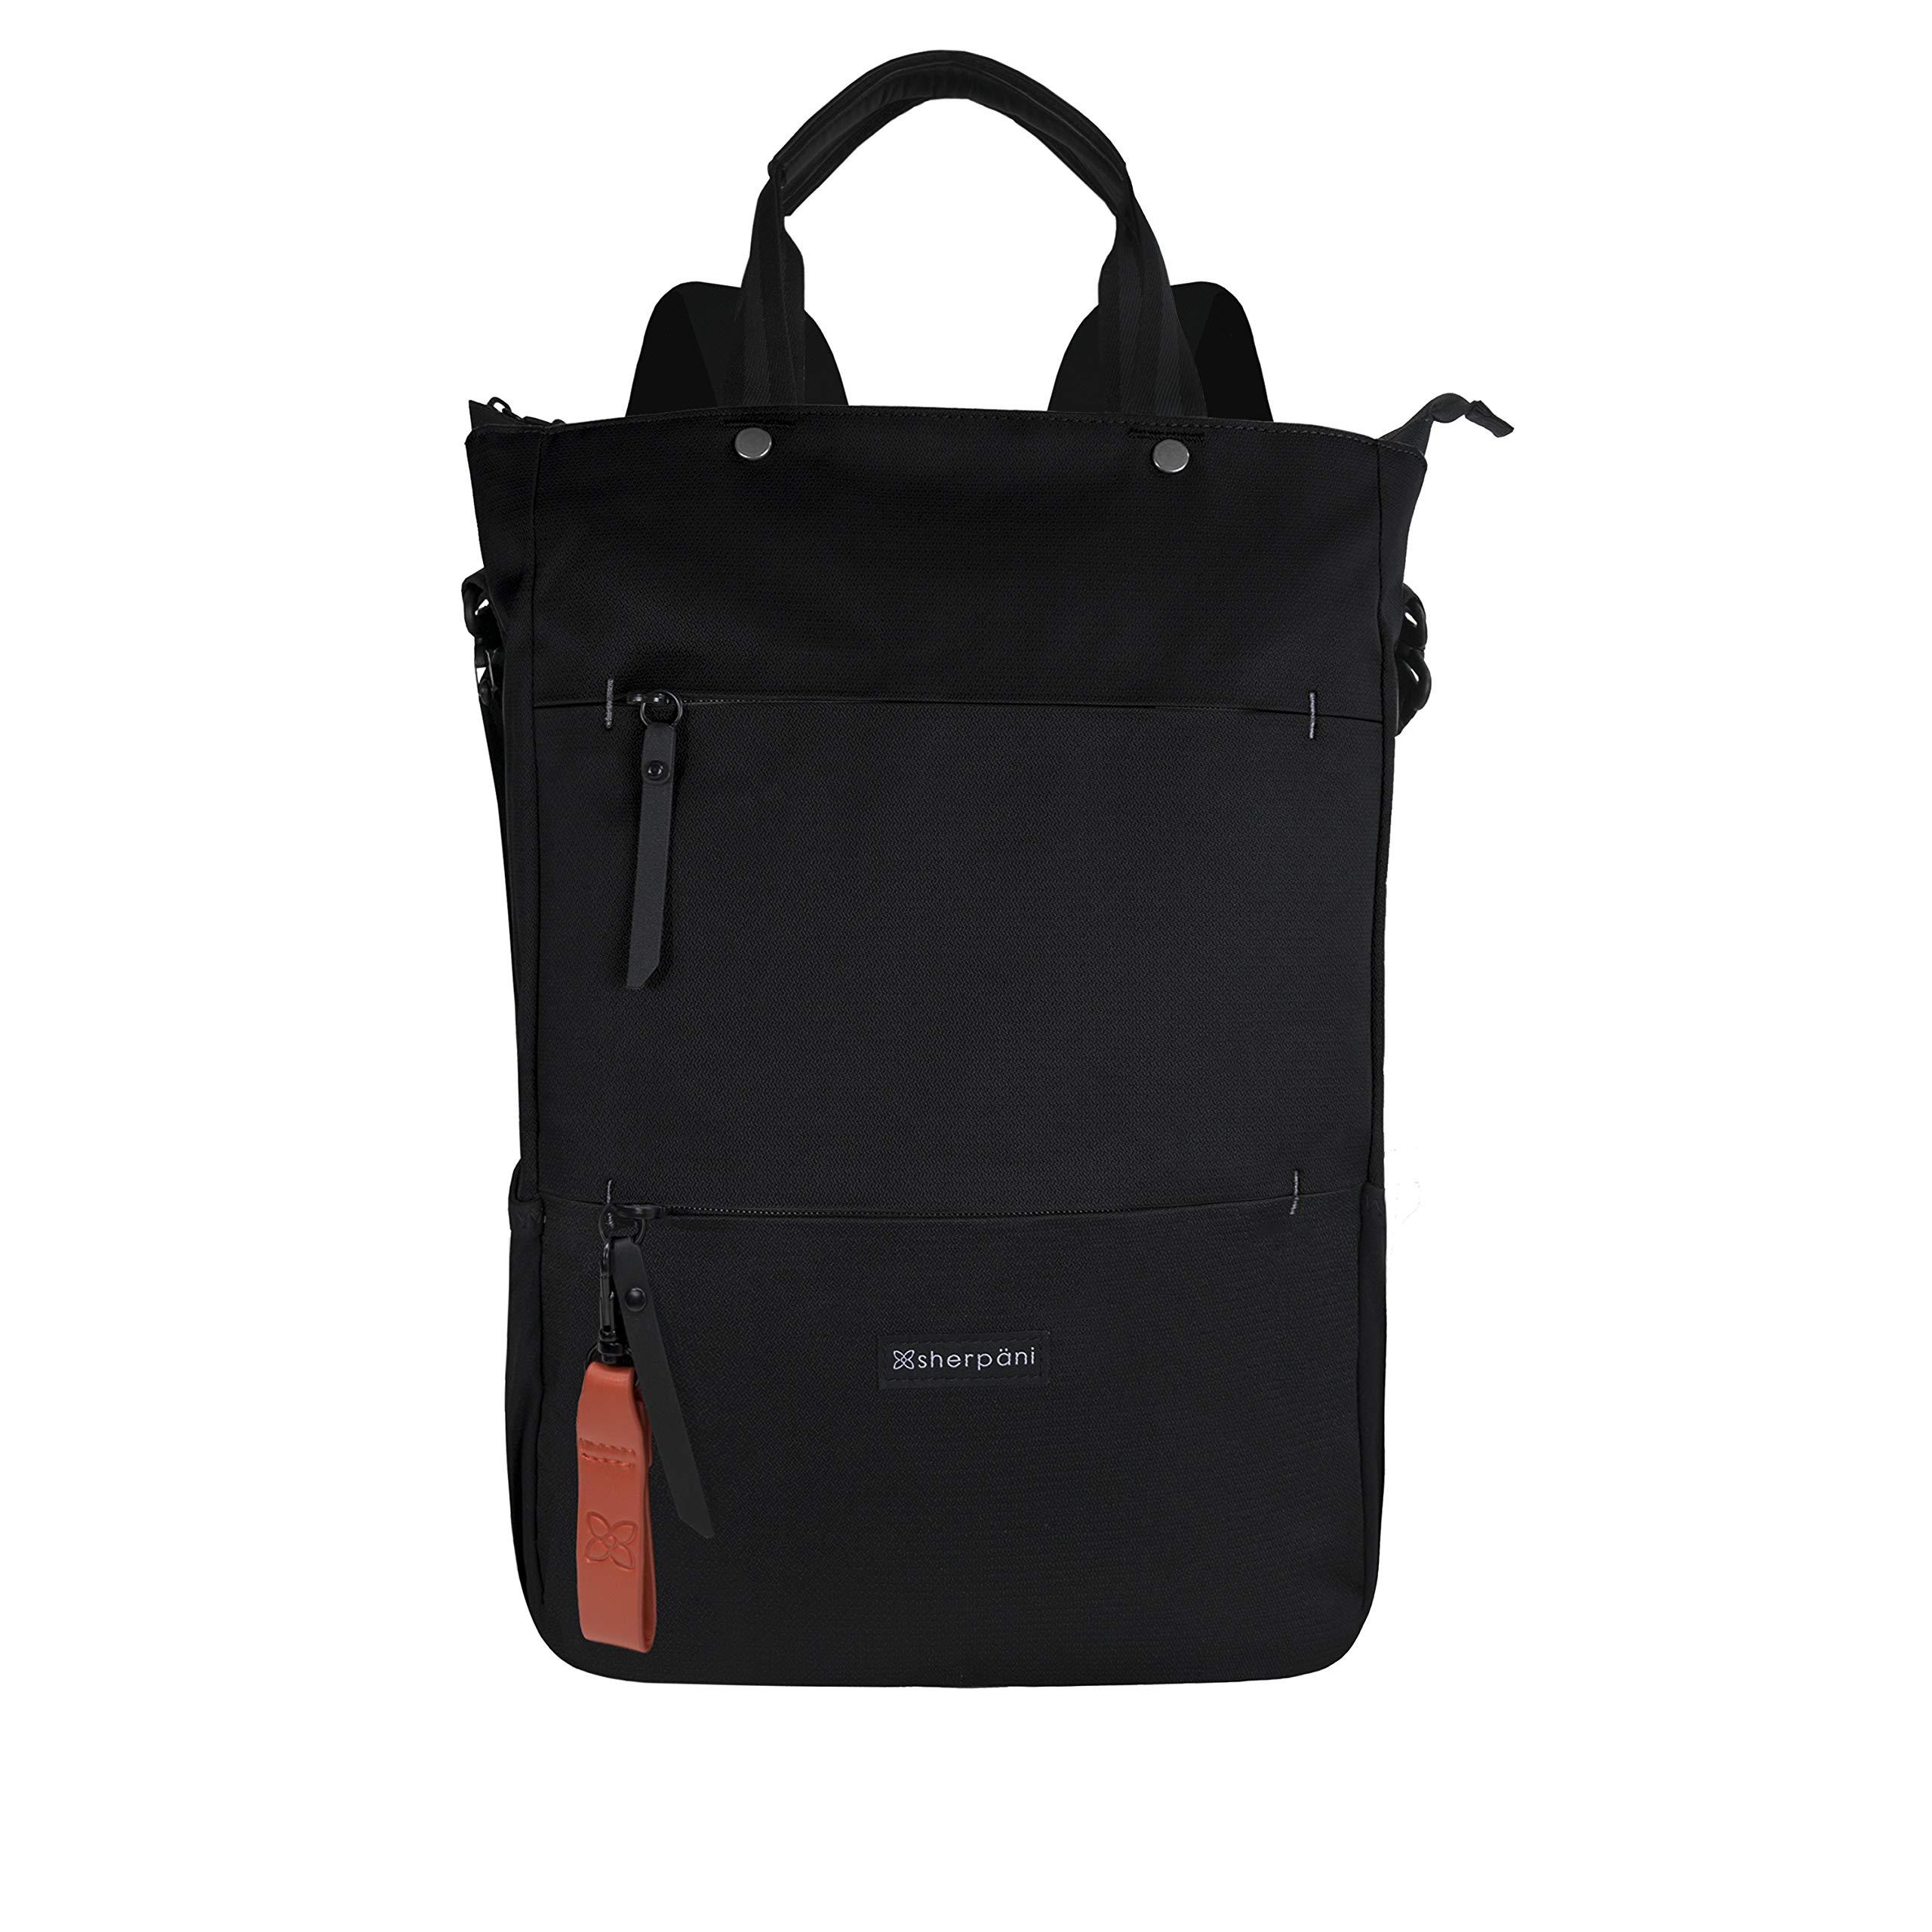 Sherpani Camden Raven Laptop Backpack, Raven by Sherpani (Image #1)